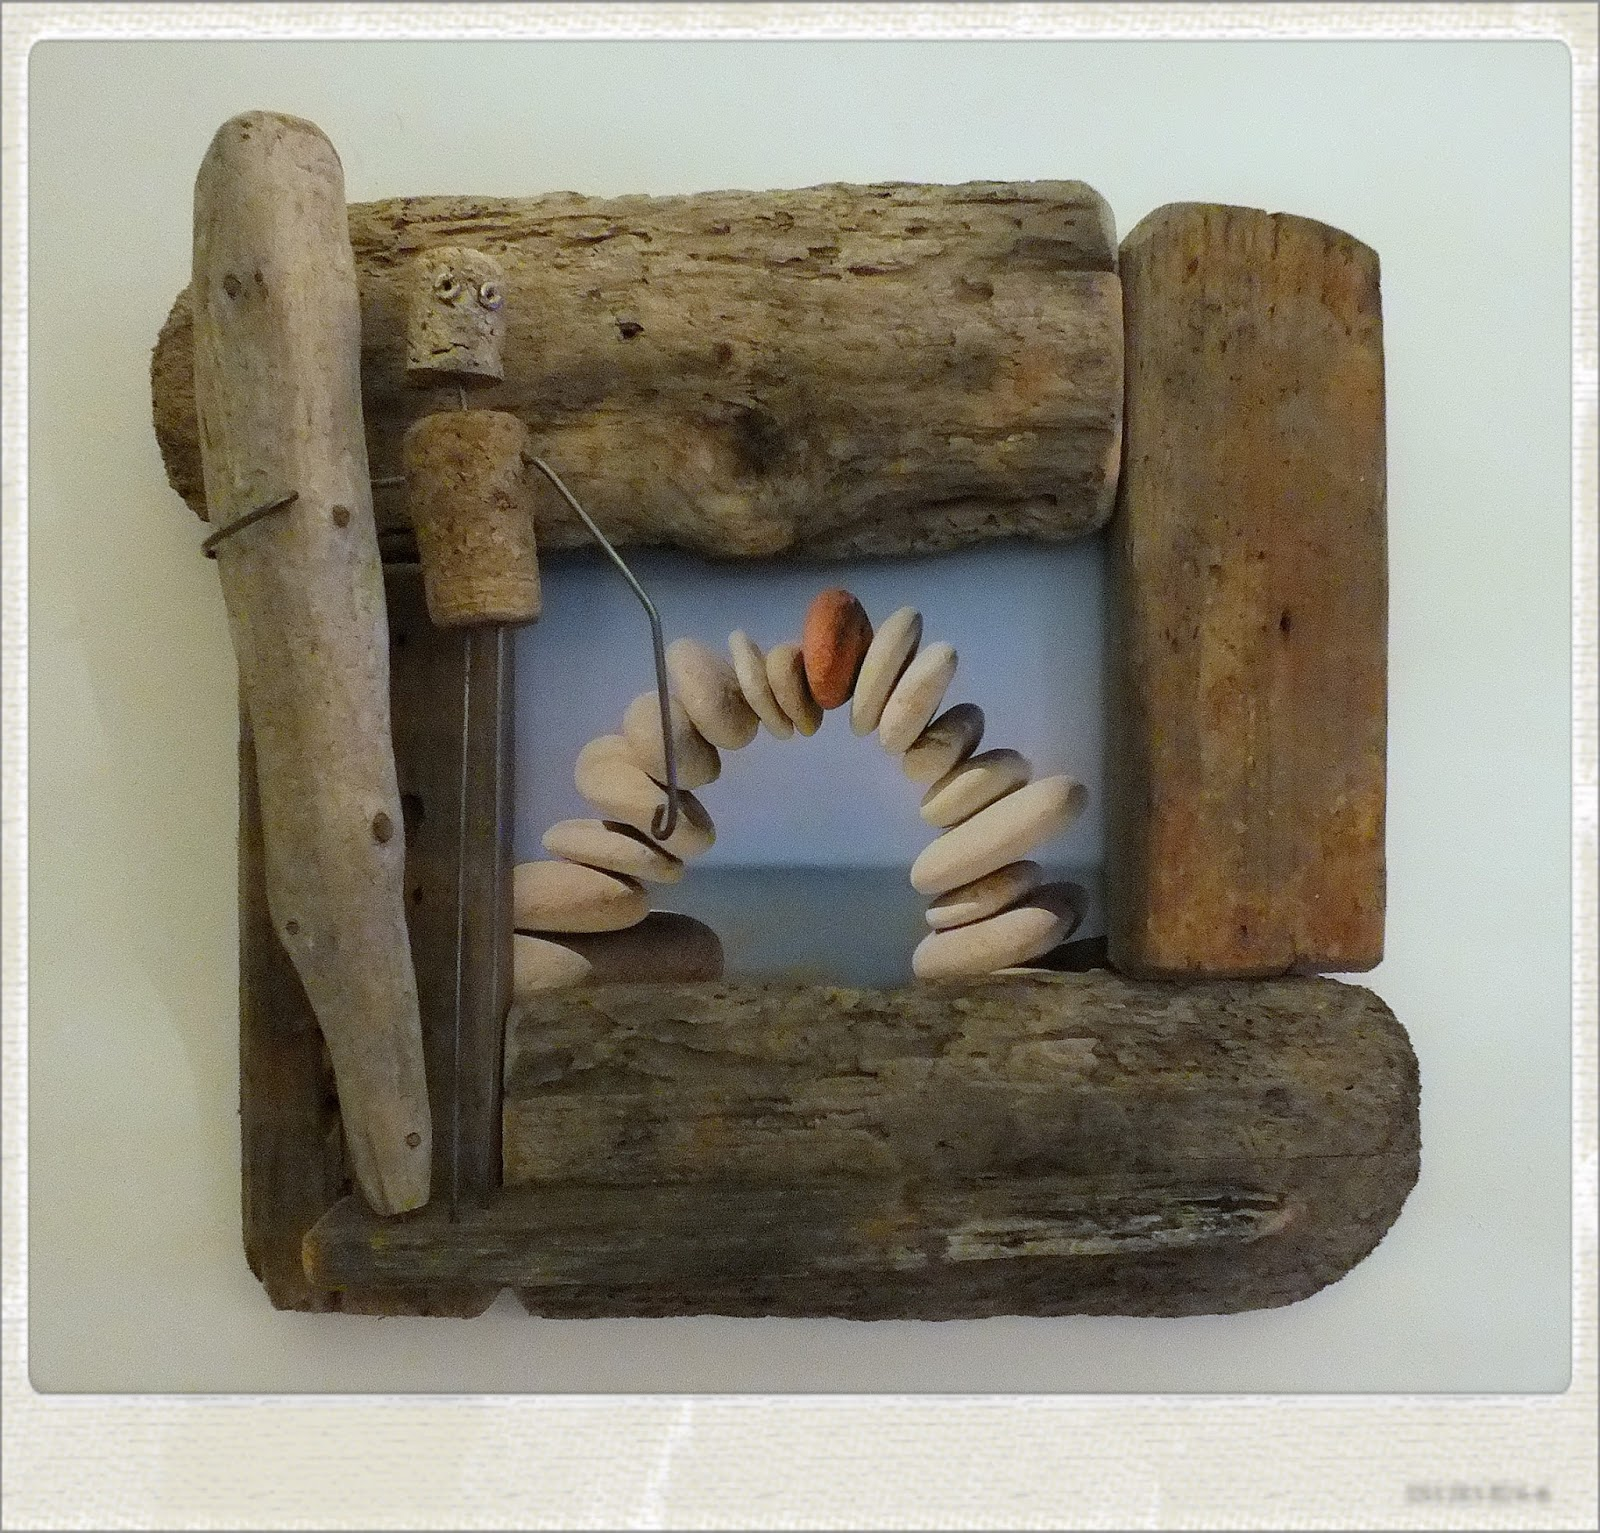 Mutoz inc art en bois flott la sauzaie for Terrasse bois flotte